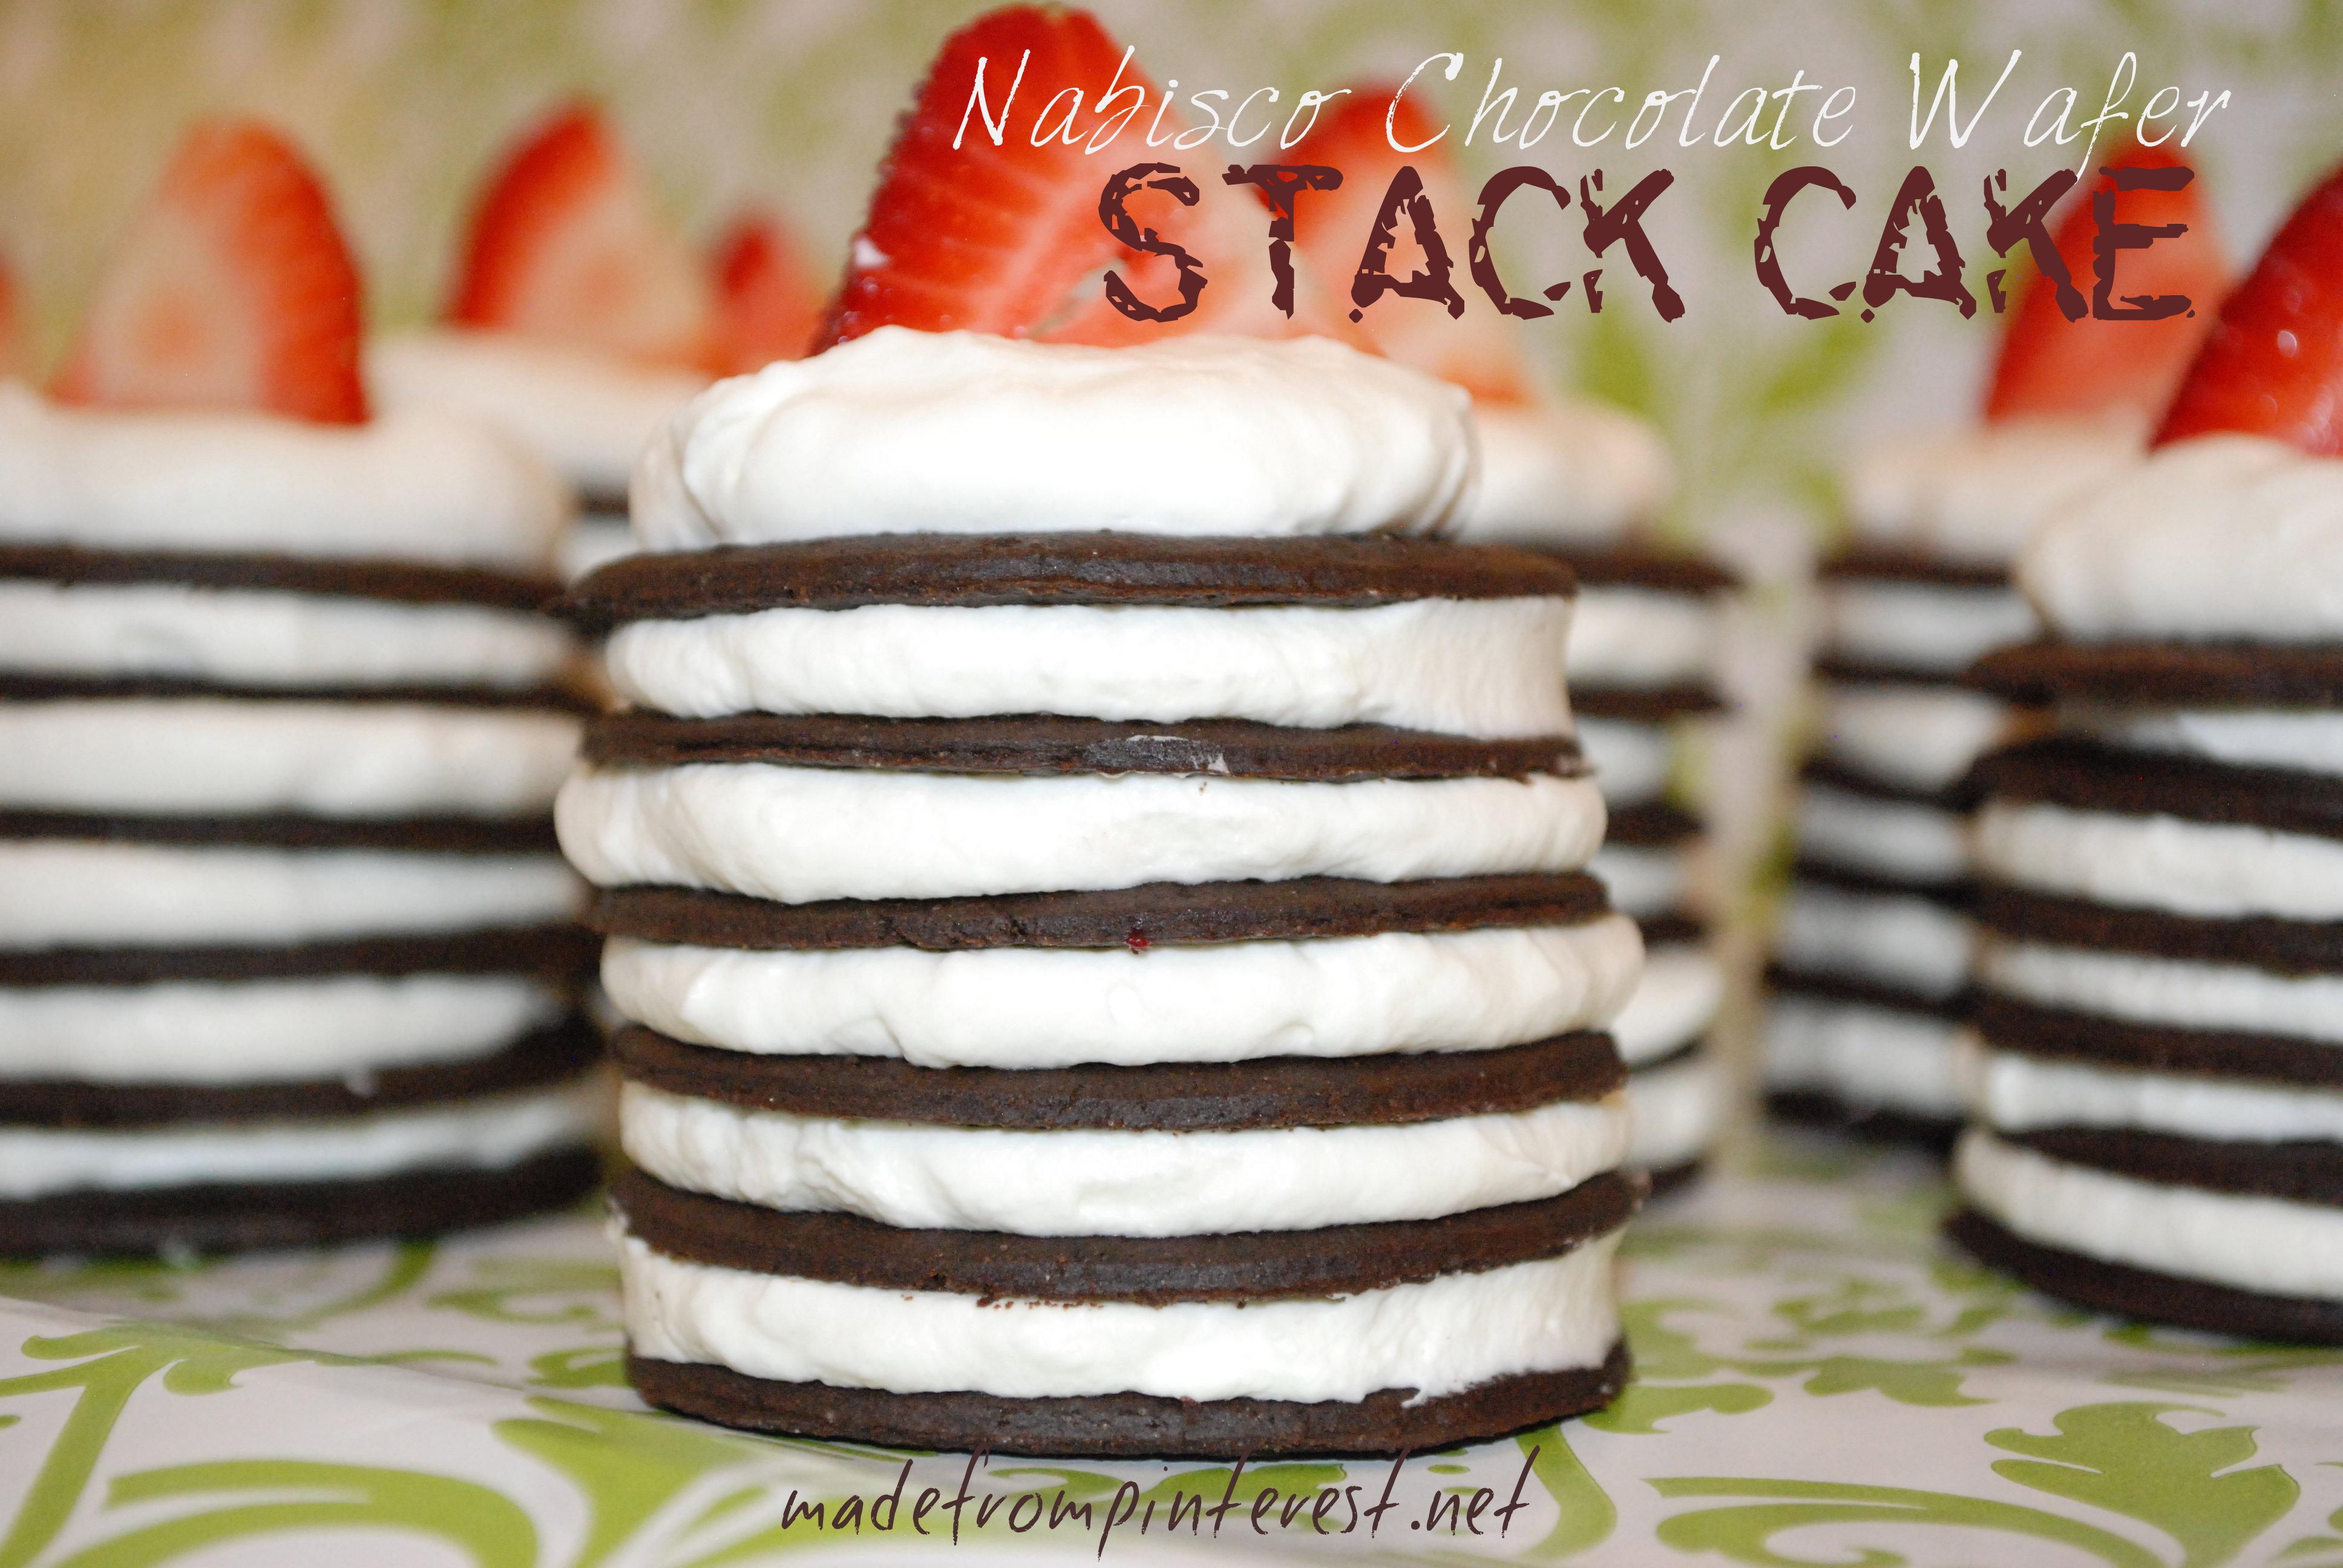 Nabisco Chocolate Wafer Cookie Cake